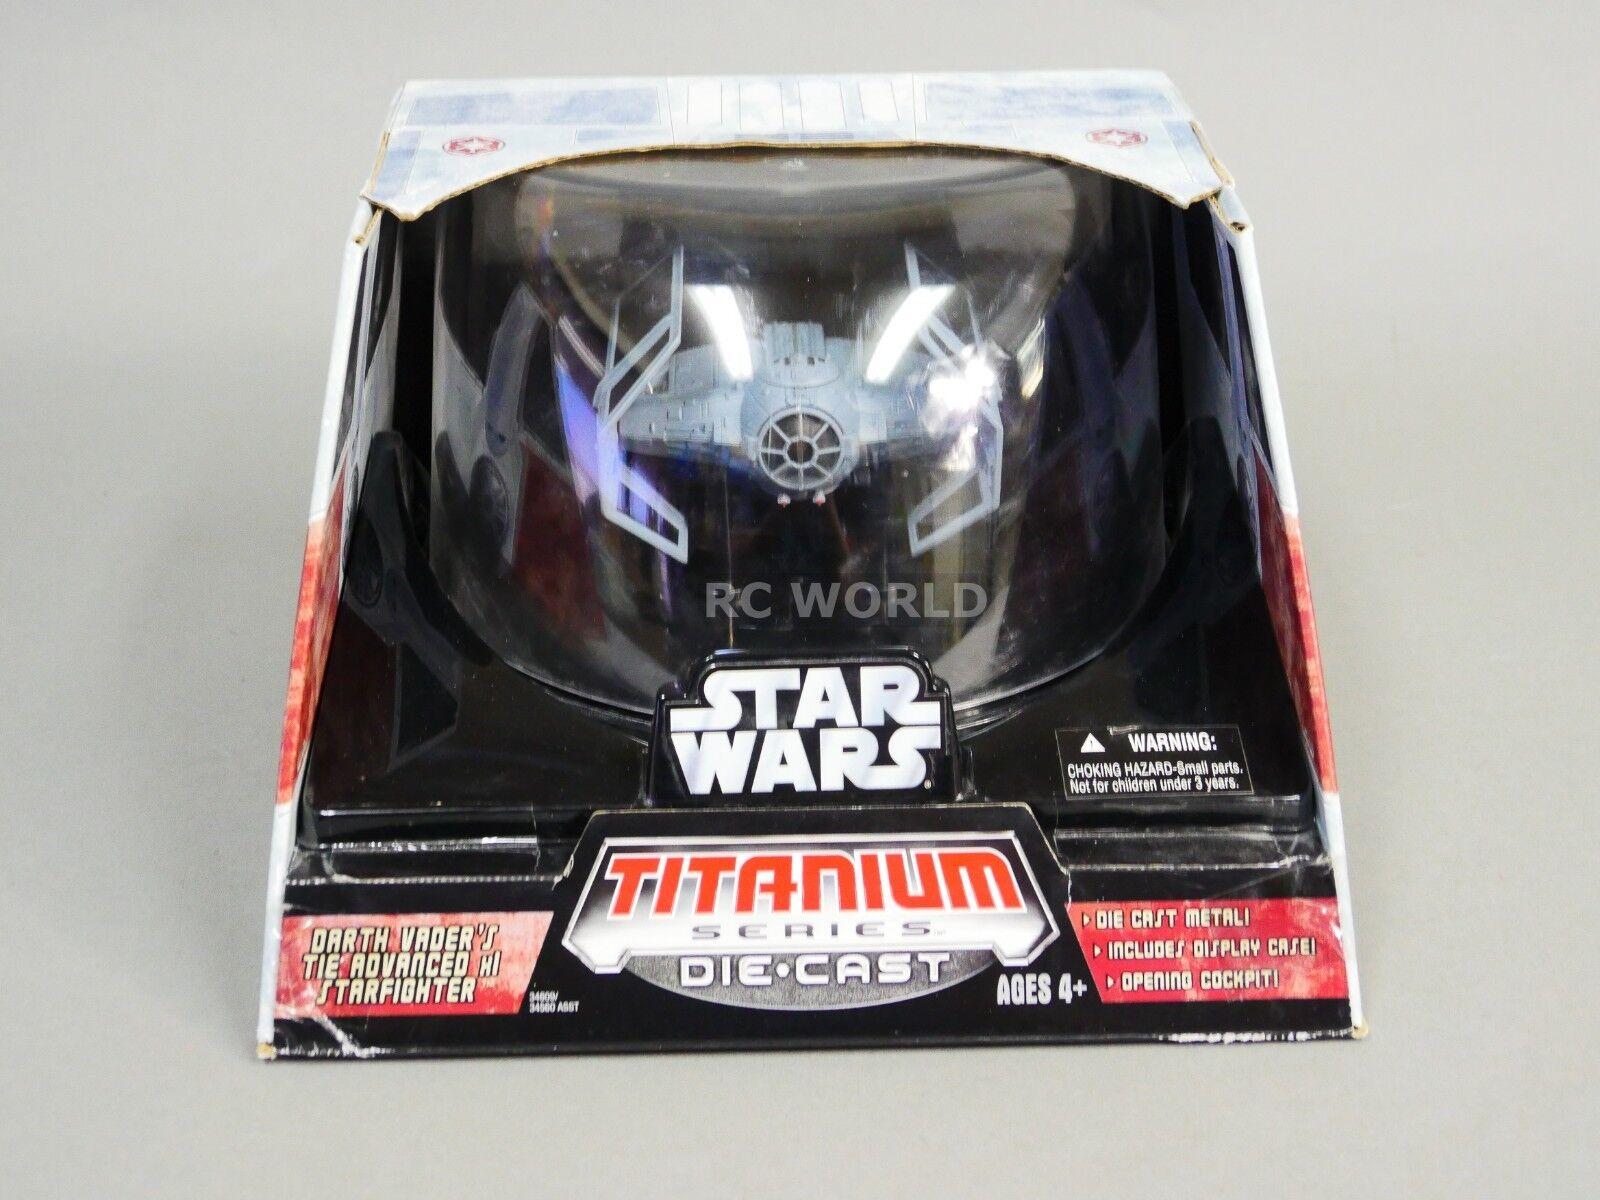 Star Wars Titanium Series DARTH VADER TIE ADVANCED FIGHTER Die-Cast Model  ob1